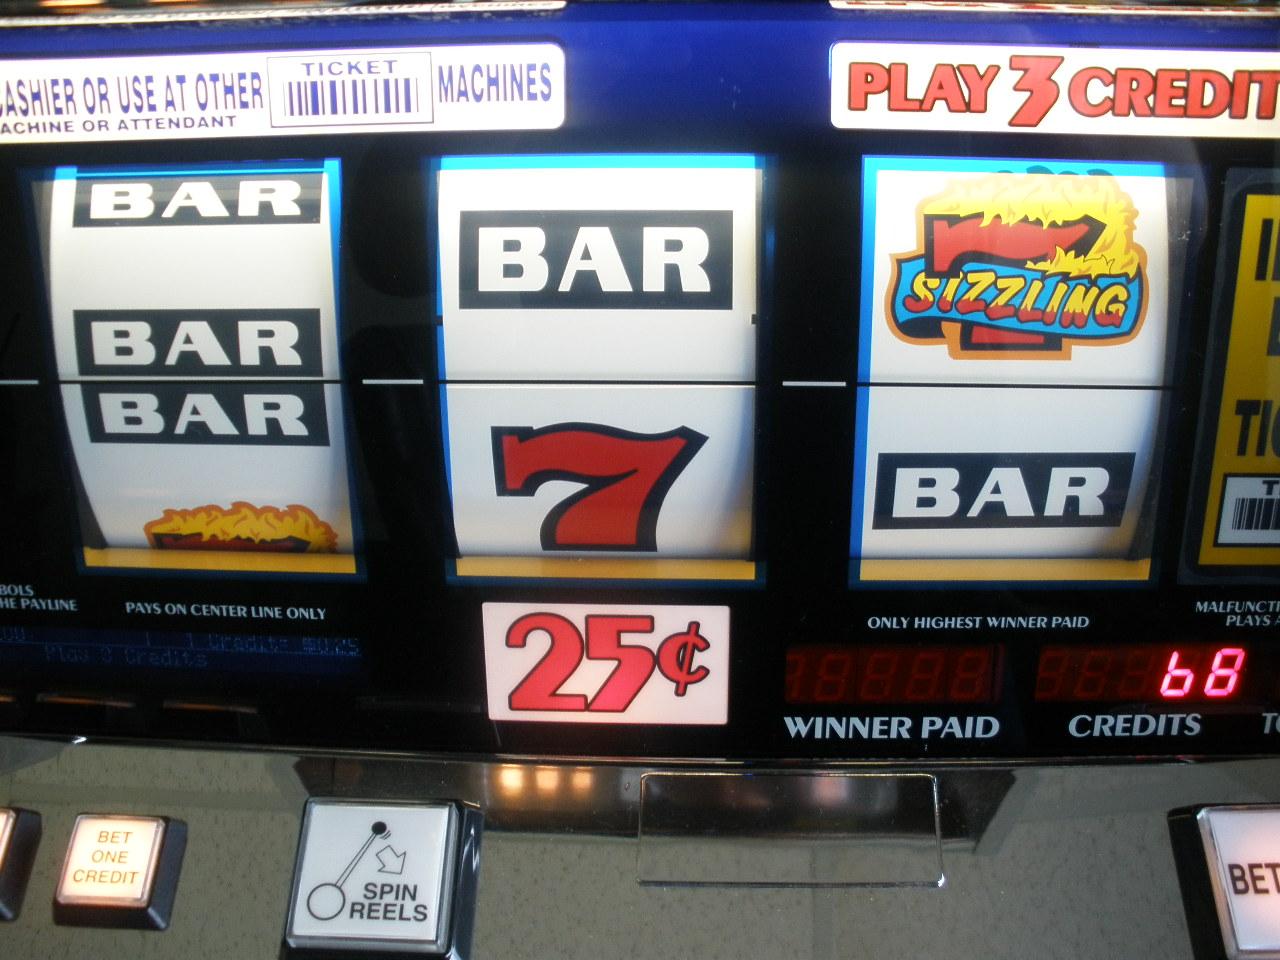 Sizzling 7 Slot Machine Game